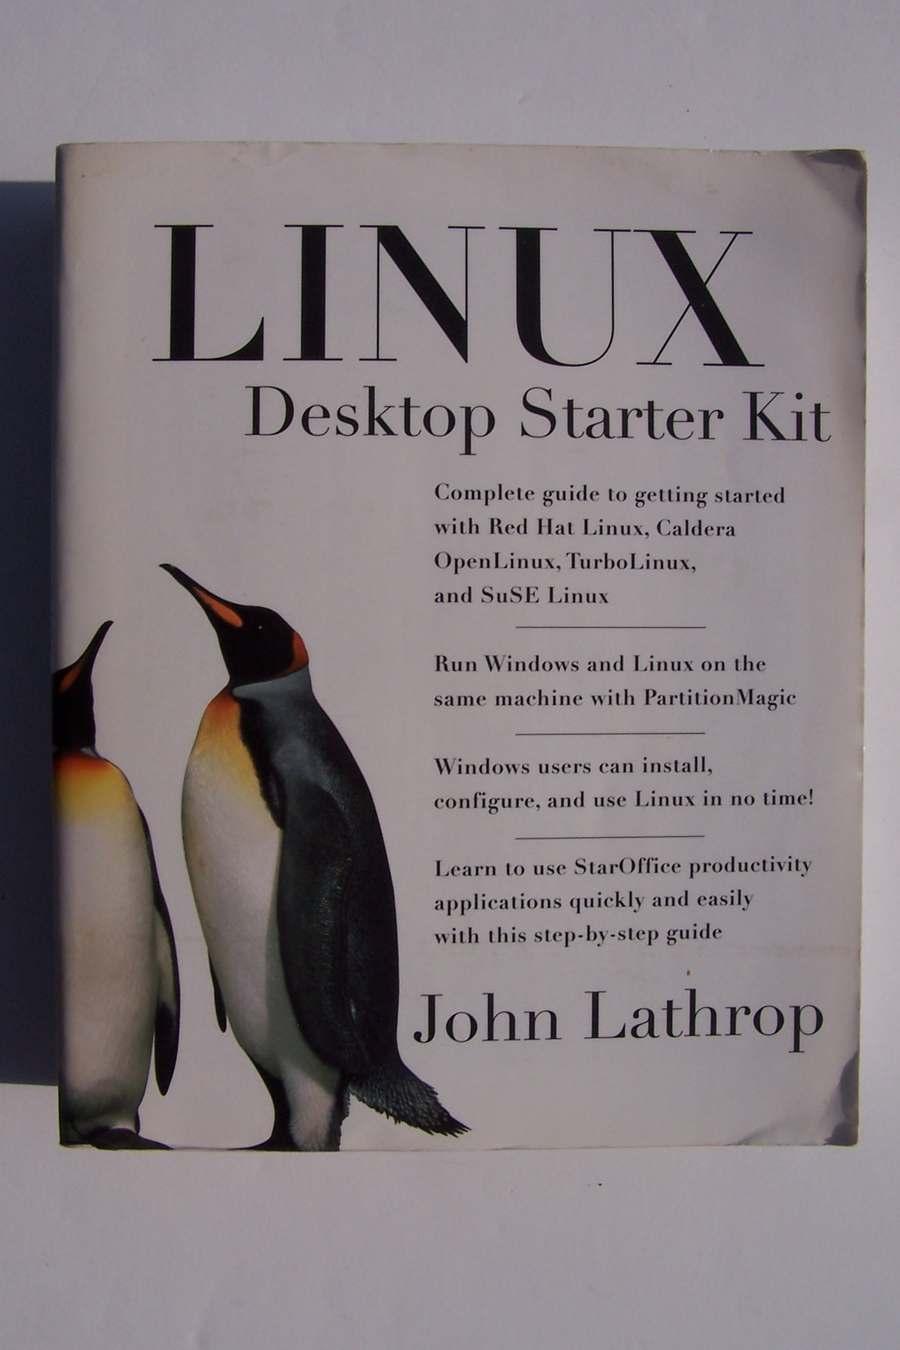 Linux Desktop Starter Kit by John Lathrop